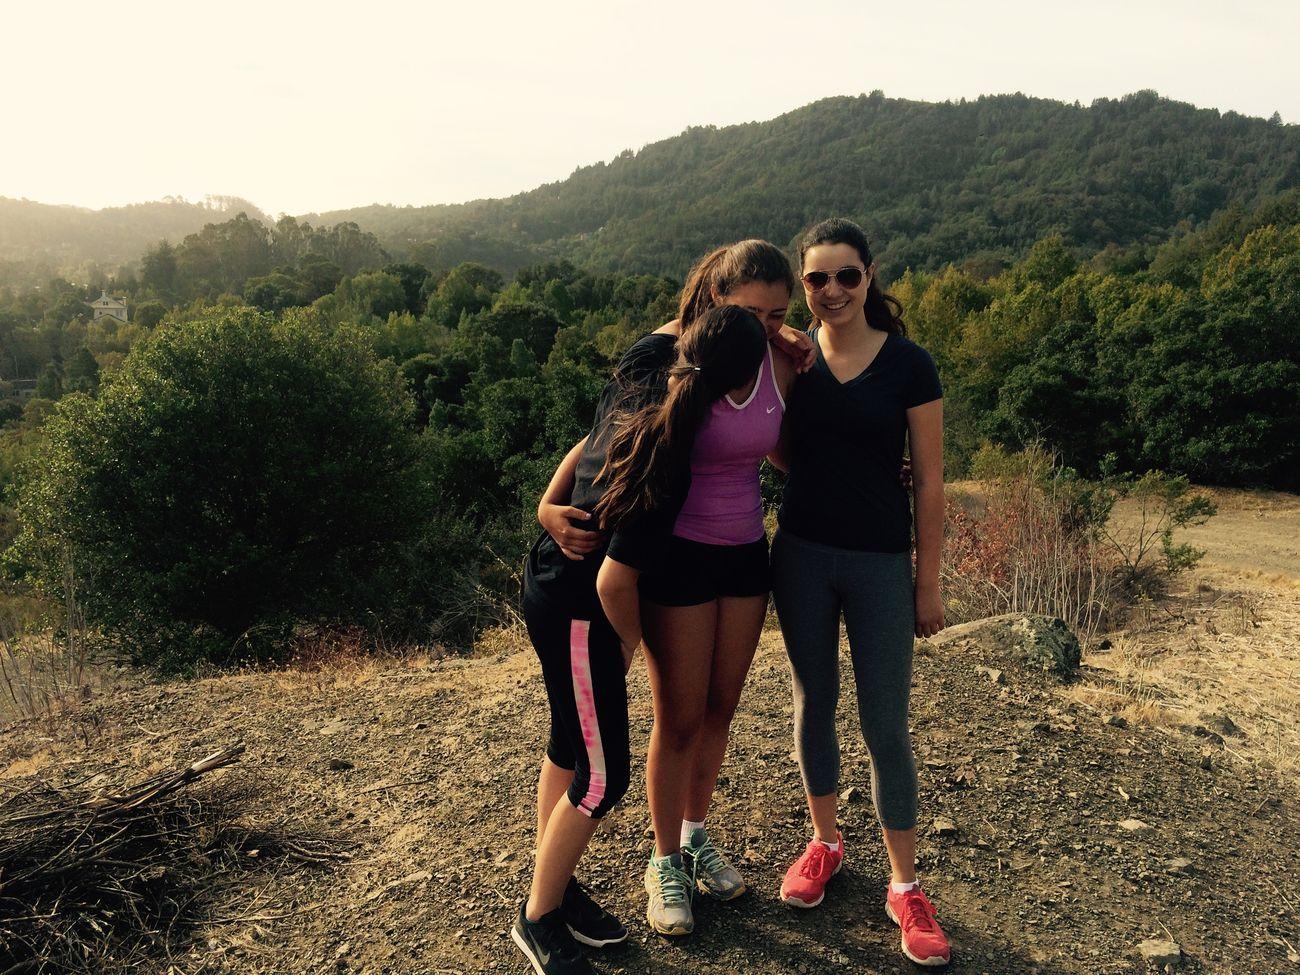 TwentySomething mini adventures